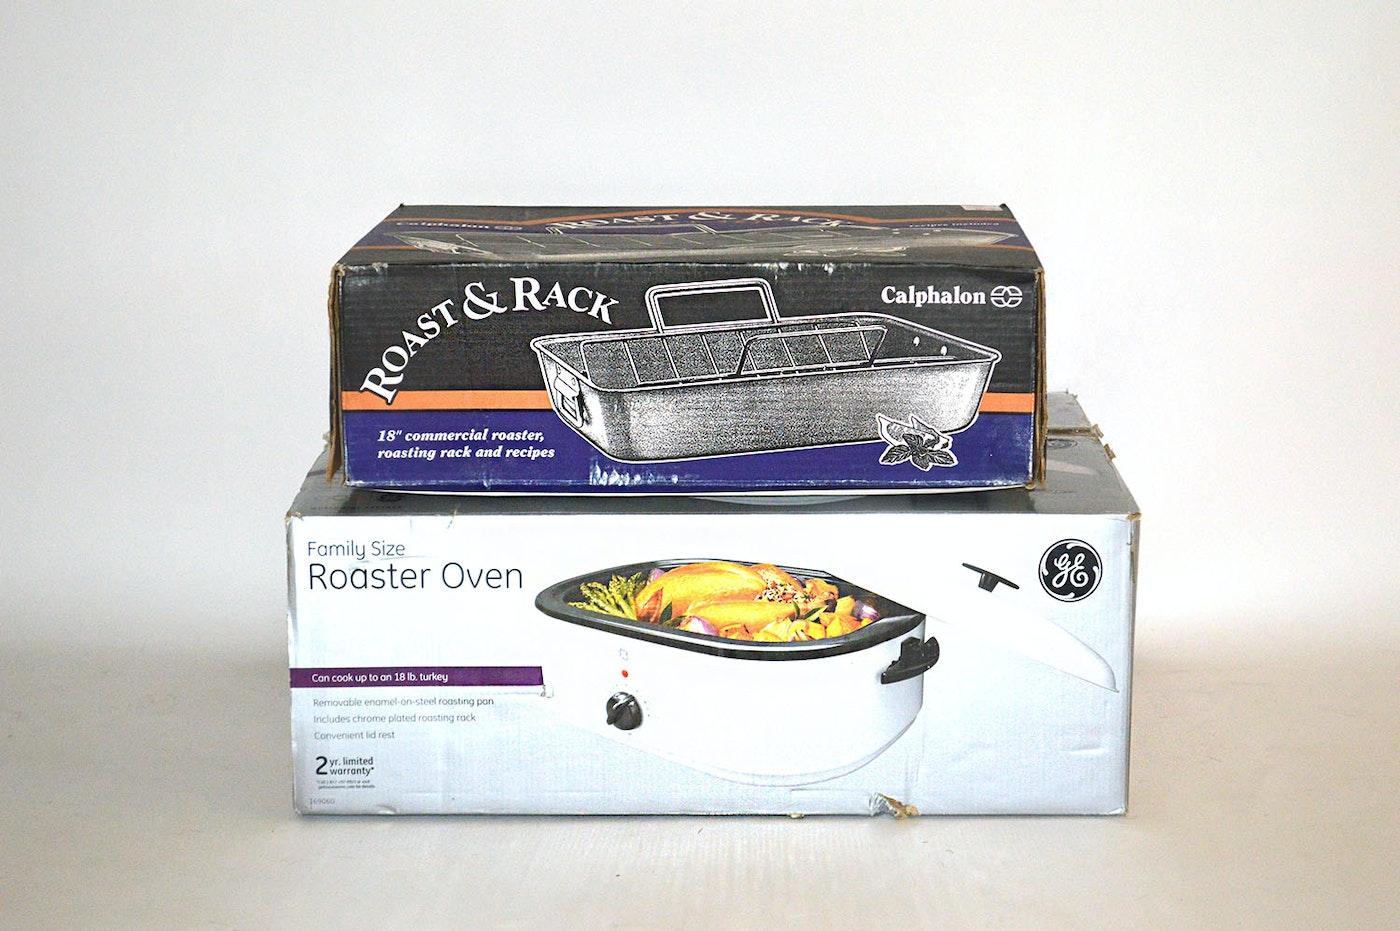 Calphalon Roast Amp Rack And Ge Family Size Roaster Oven Ebth